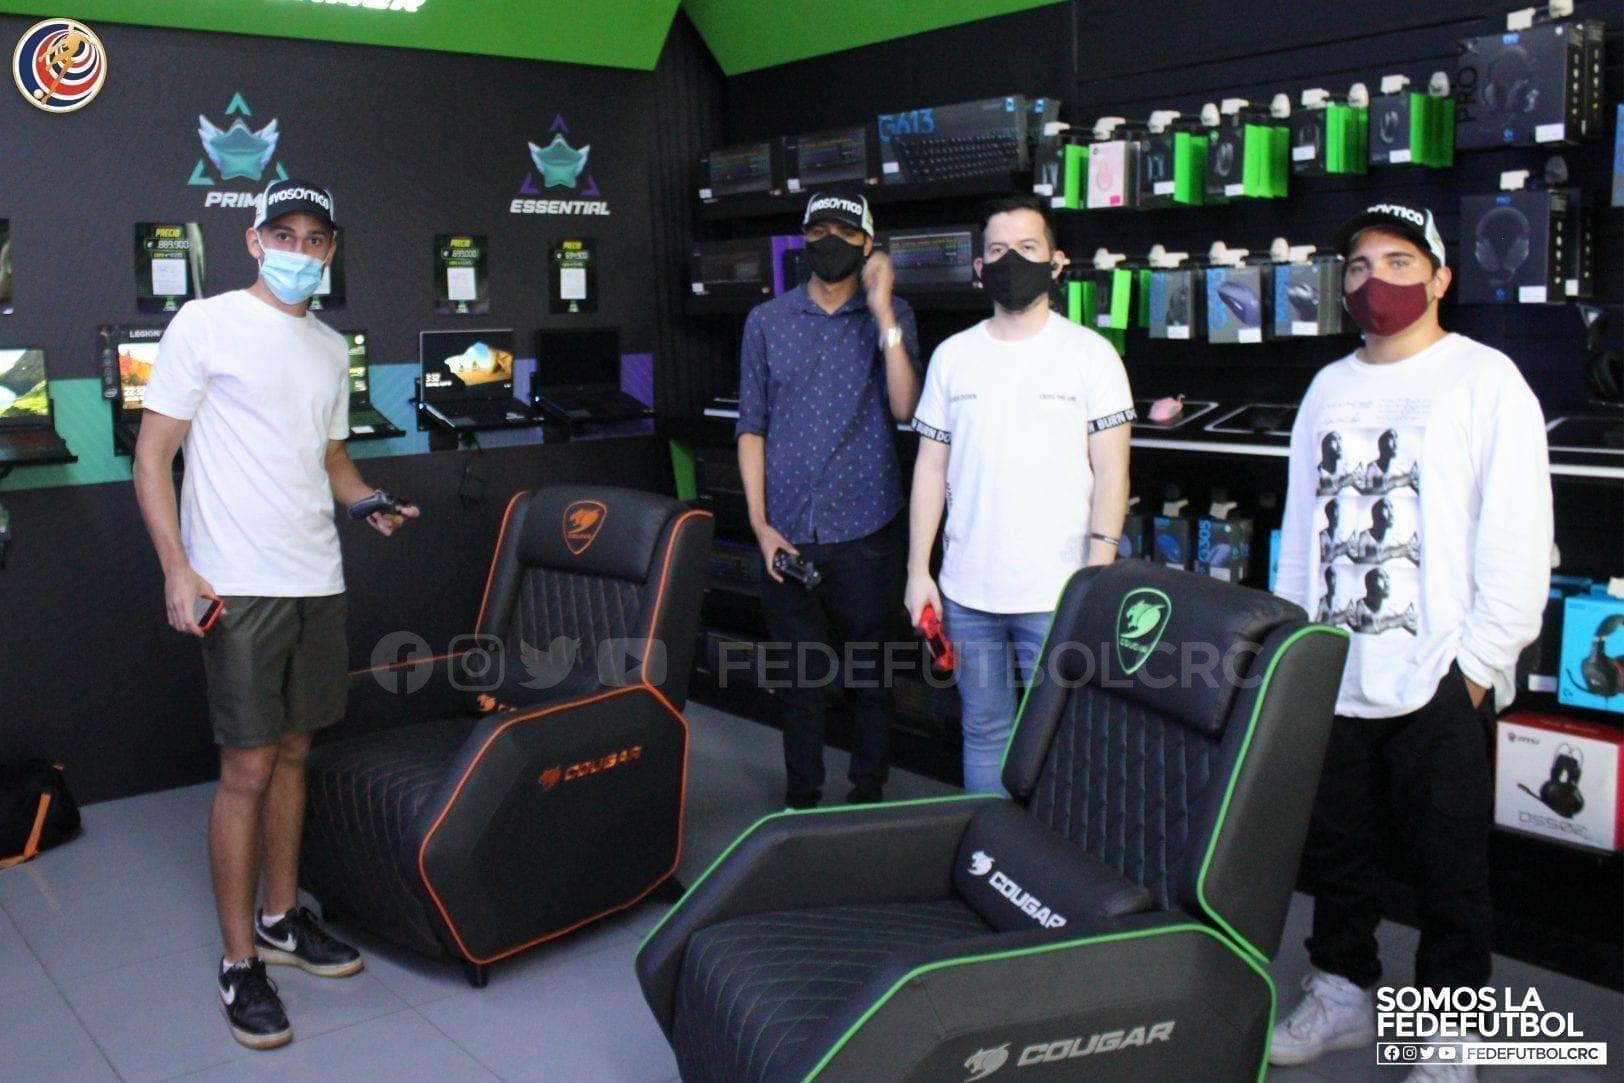 Gamer Lab de Monge vibró con la final del FIFA eNations 2021